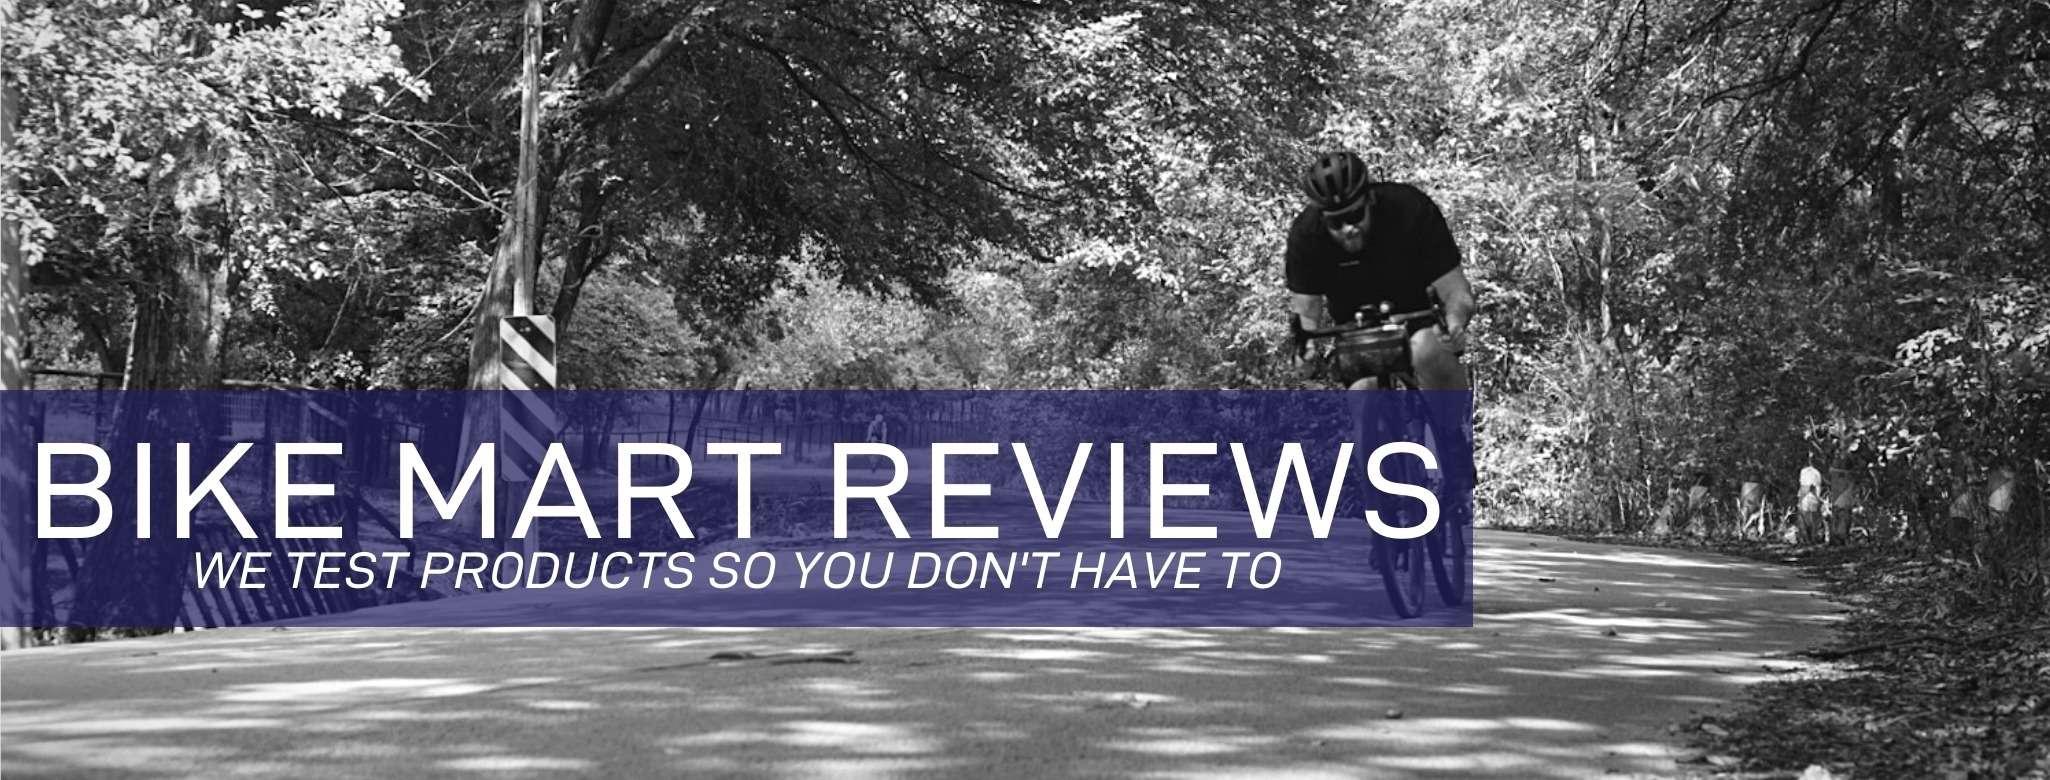 Bike Mart Reviews